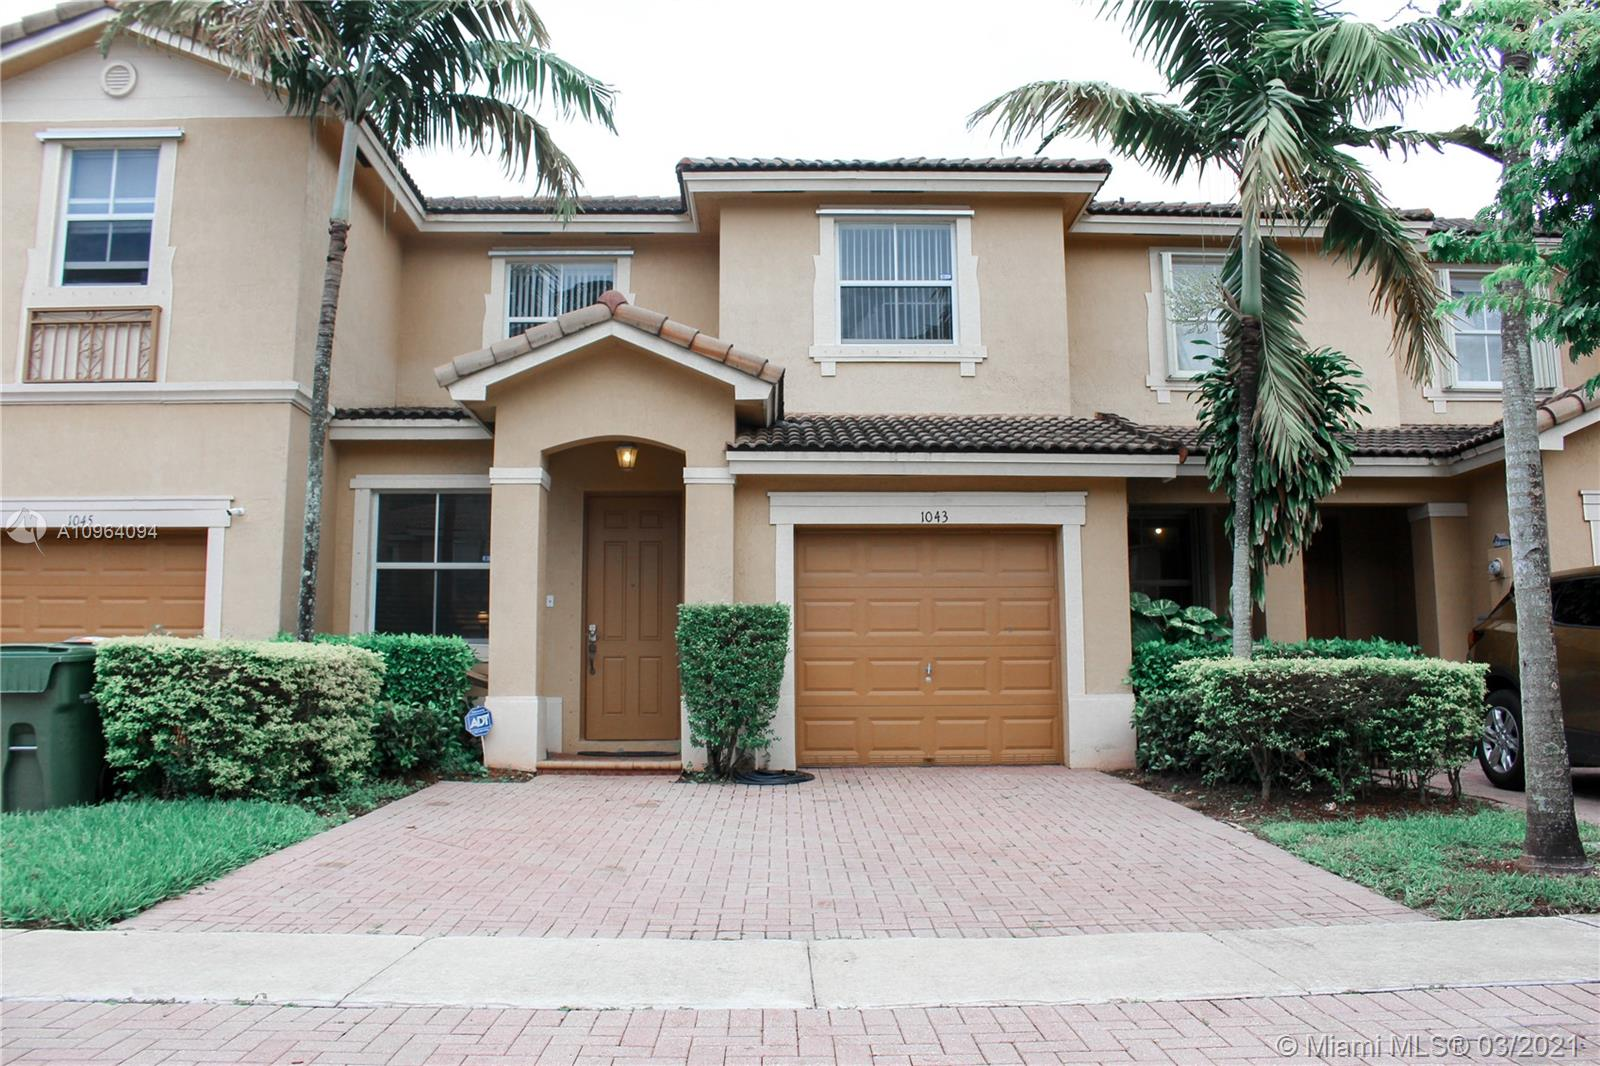 1043 NE 42nd Ave #1043 Property Photo - Homestead, FL real estate listing